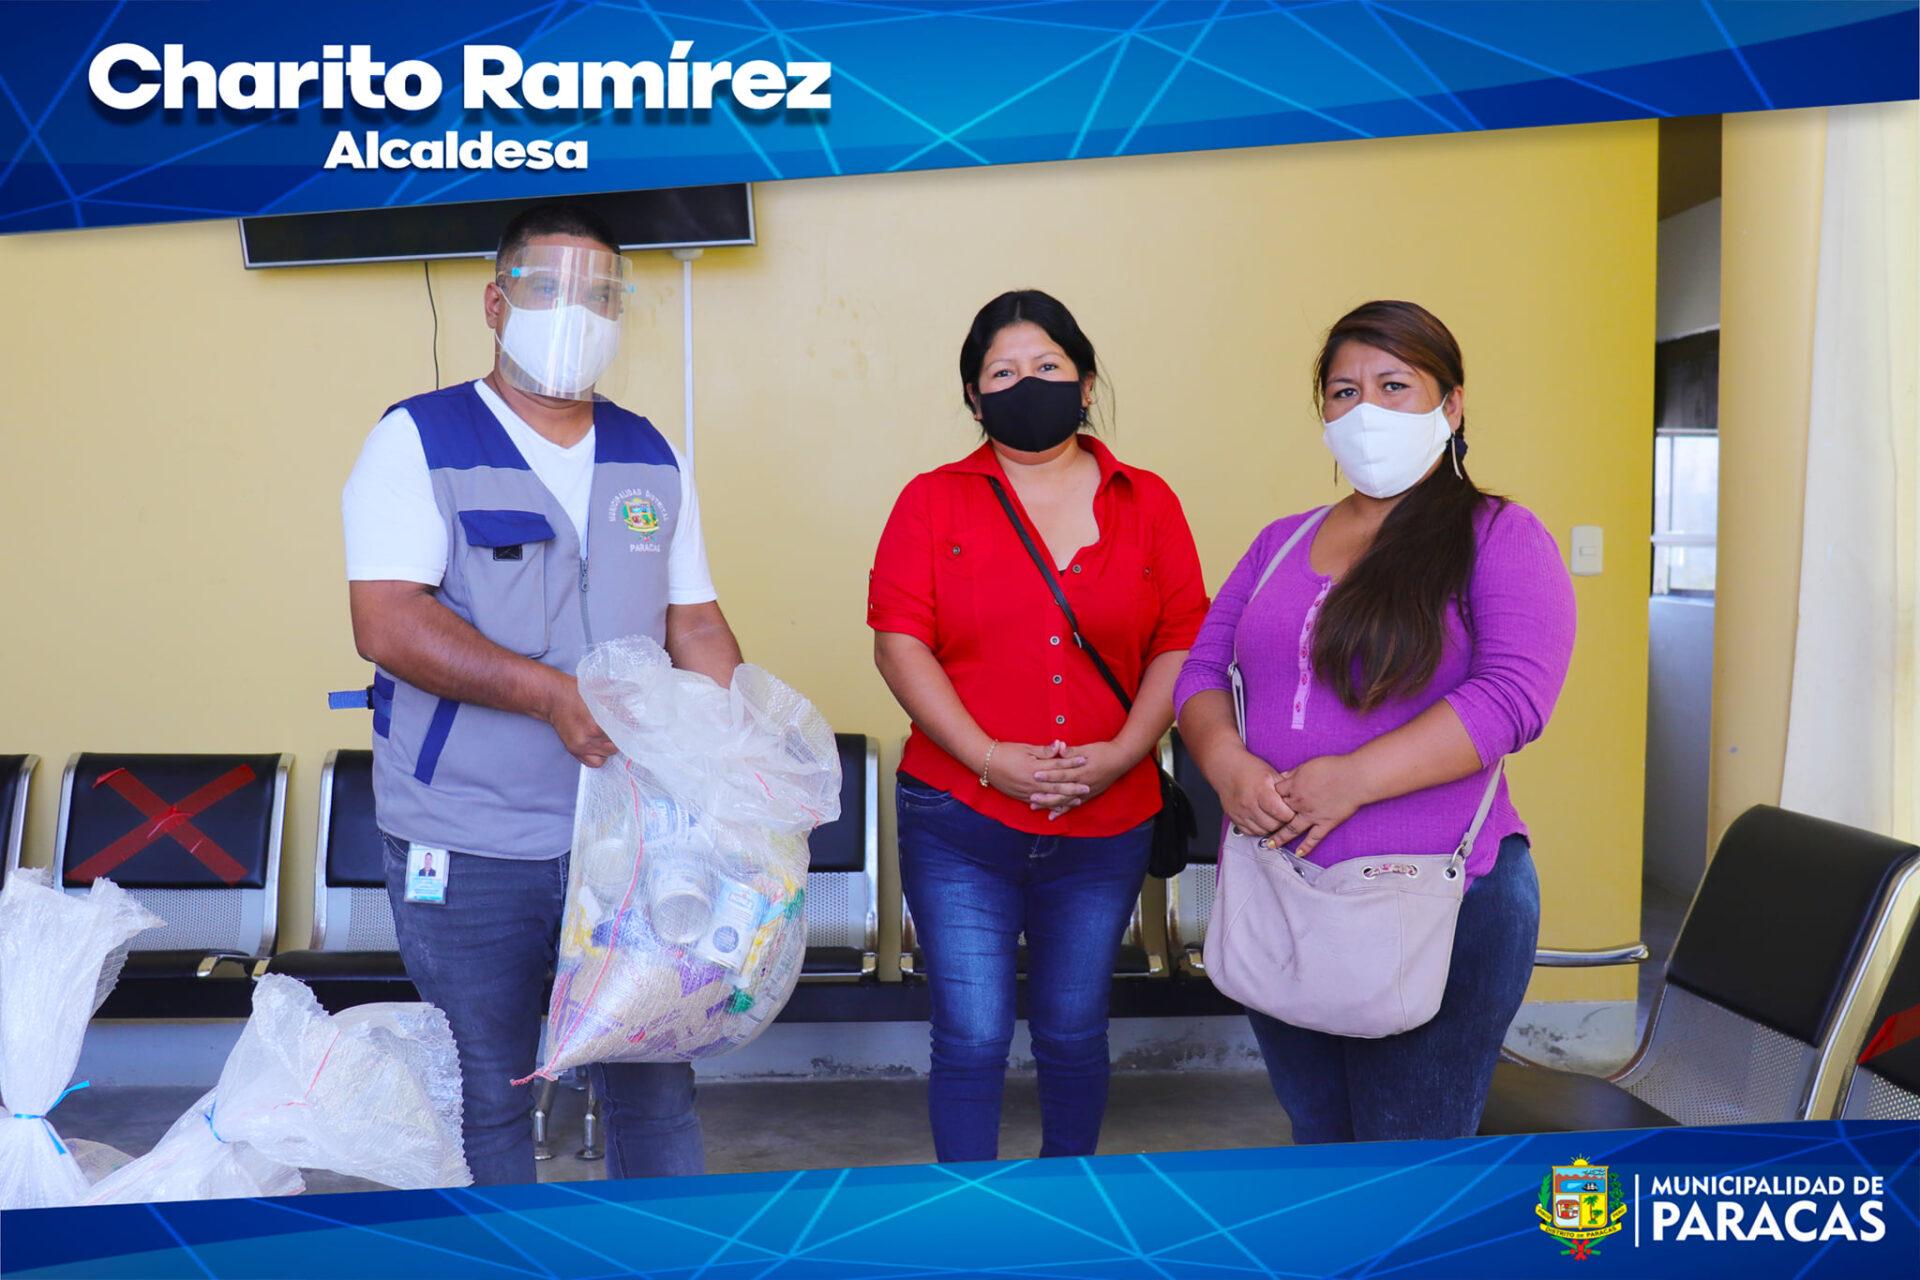 Thumbnail for the post titled: 🔴🔵ALCALDESA CHARITO RAMÍREZ ENTREGÓ BOLSAS CON VÍVERES  A MIEMBROS DE DIVERSAS ASOCIACIONES DE ARTESANOS, PESCADORES, SOMBRILLEROS Y COMIDA RÁPIDA DEL DISTRITO